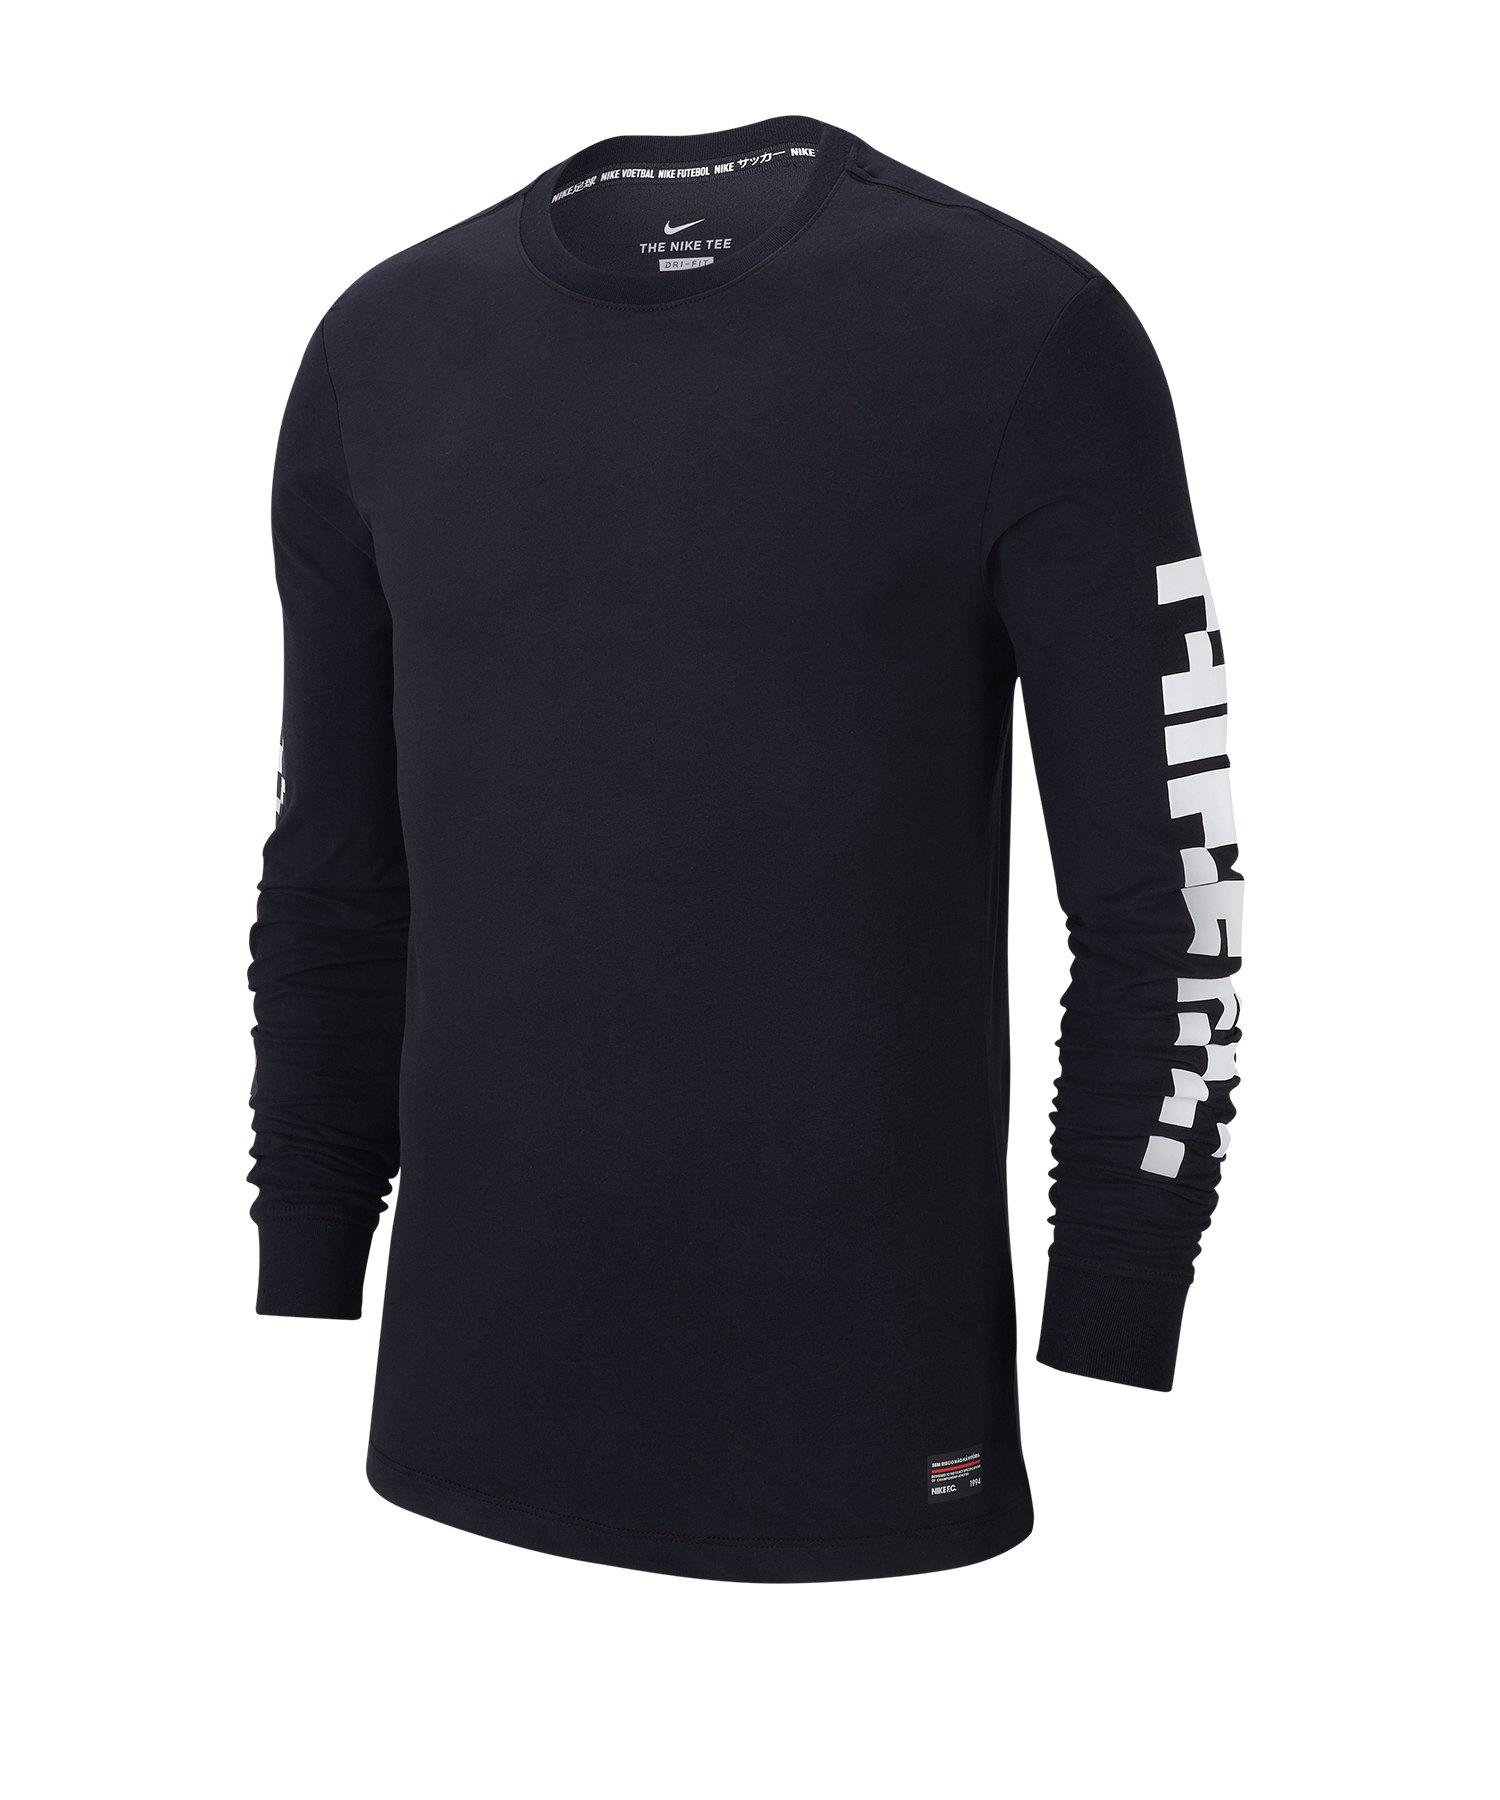 Nike F.C. Sweatshirt Schwarz F010 - schwarz